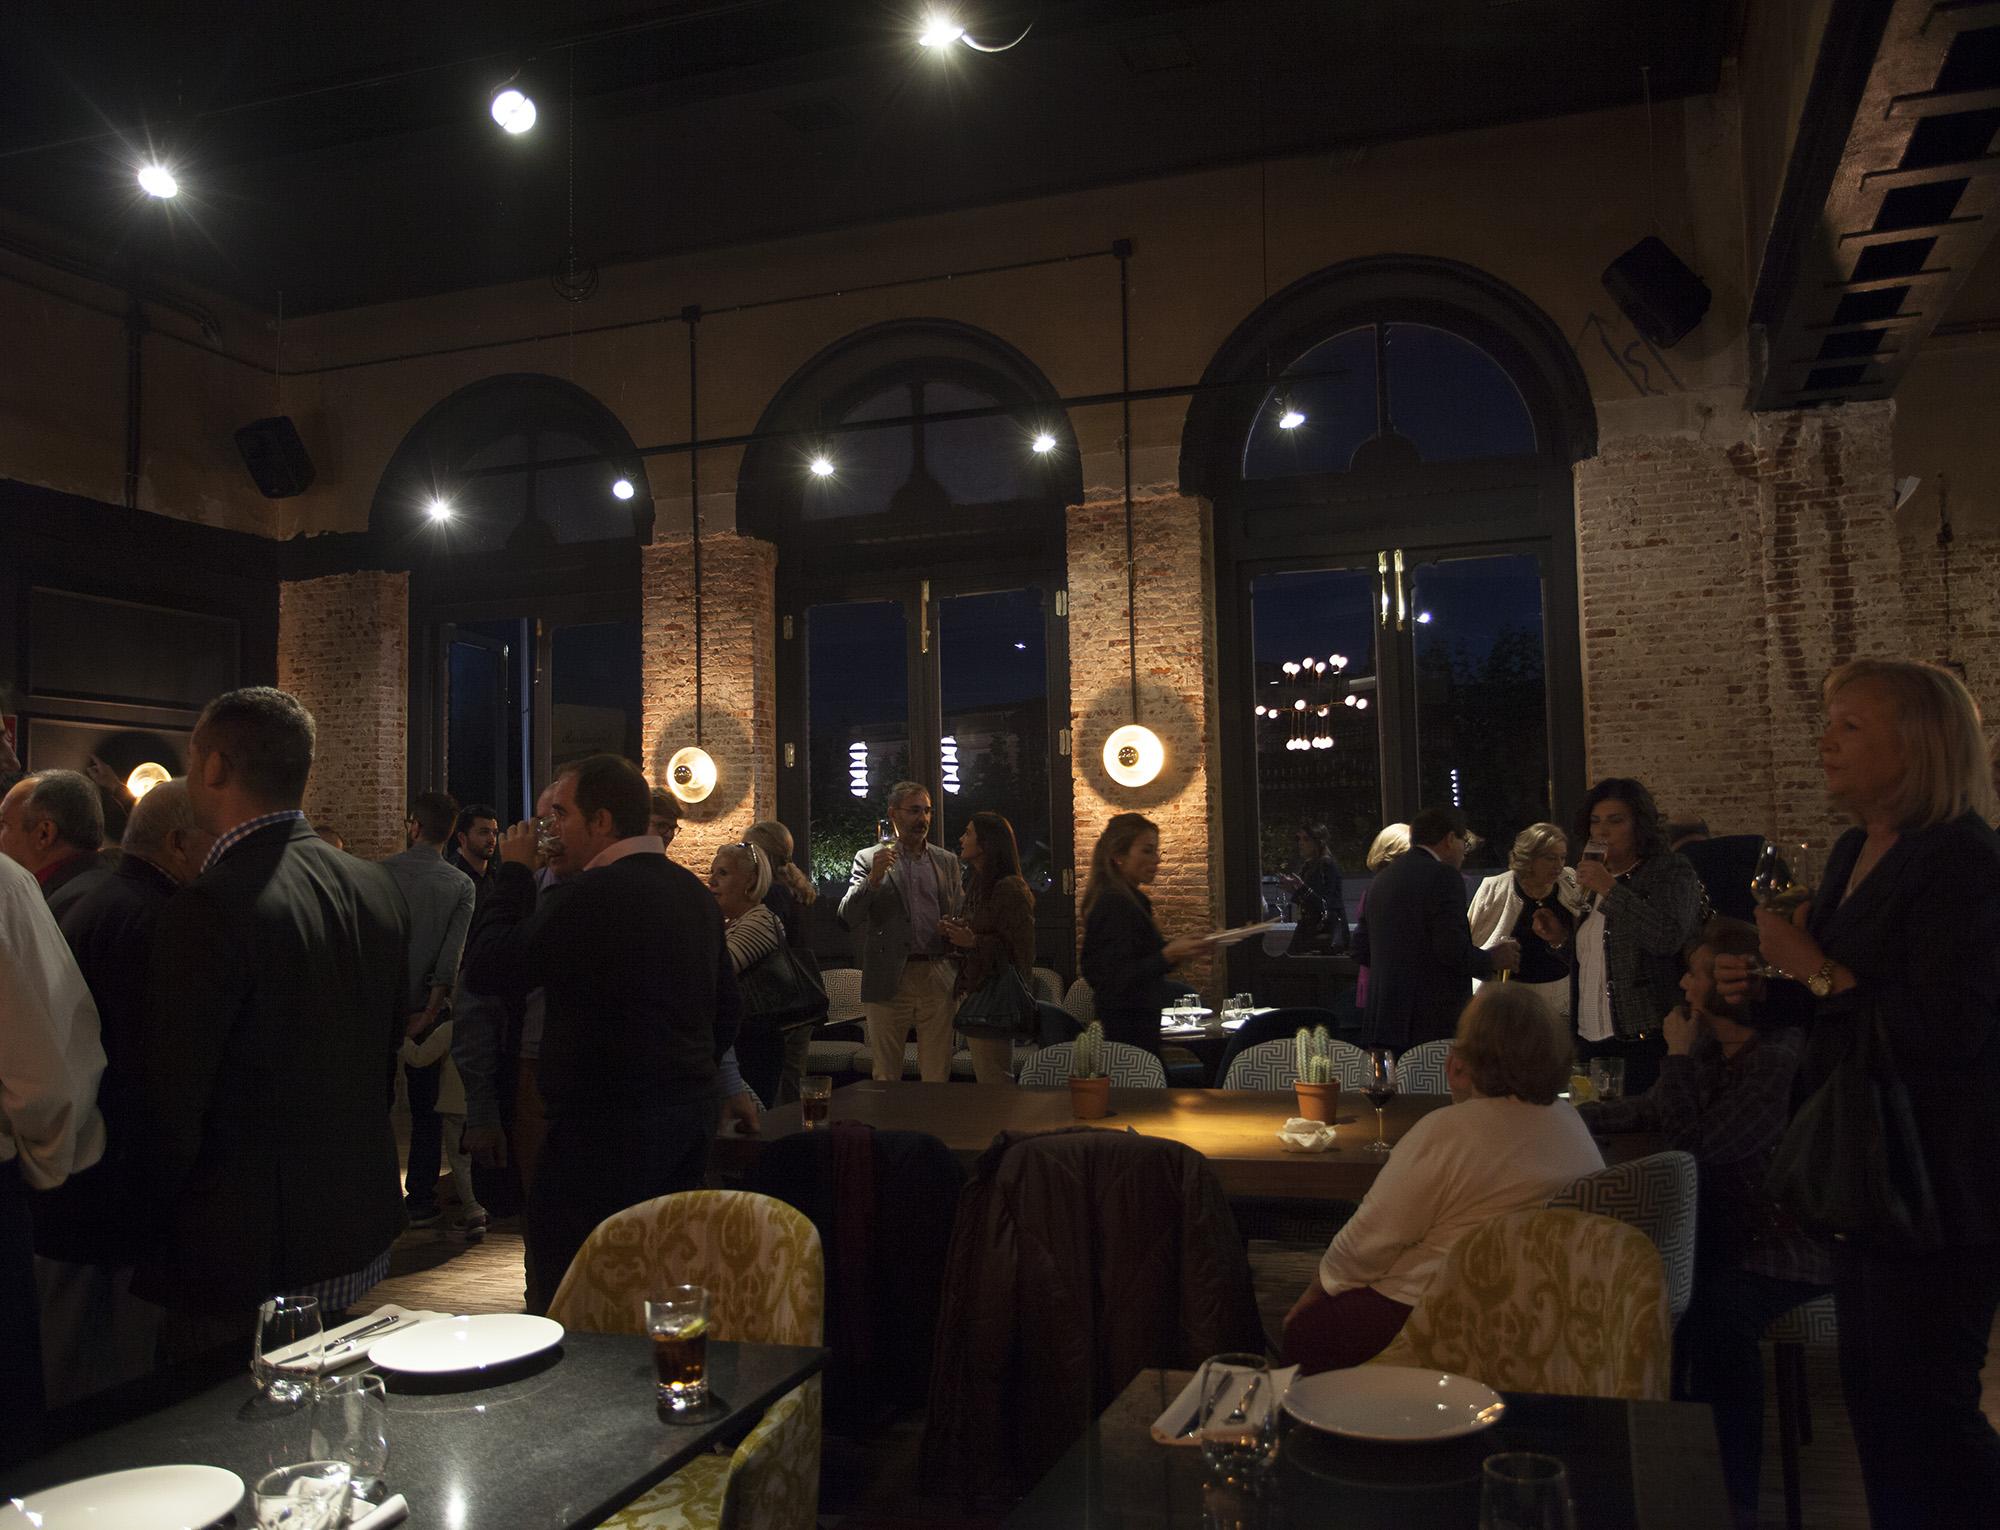 Eventos en restaurante Casino Alcalá, en Alcalá de Henares